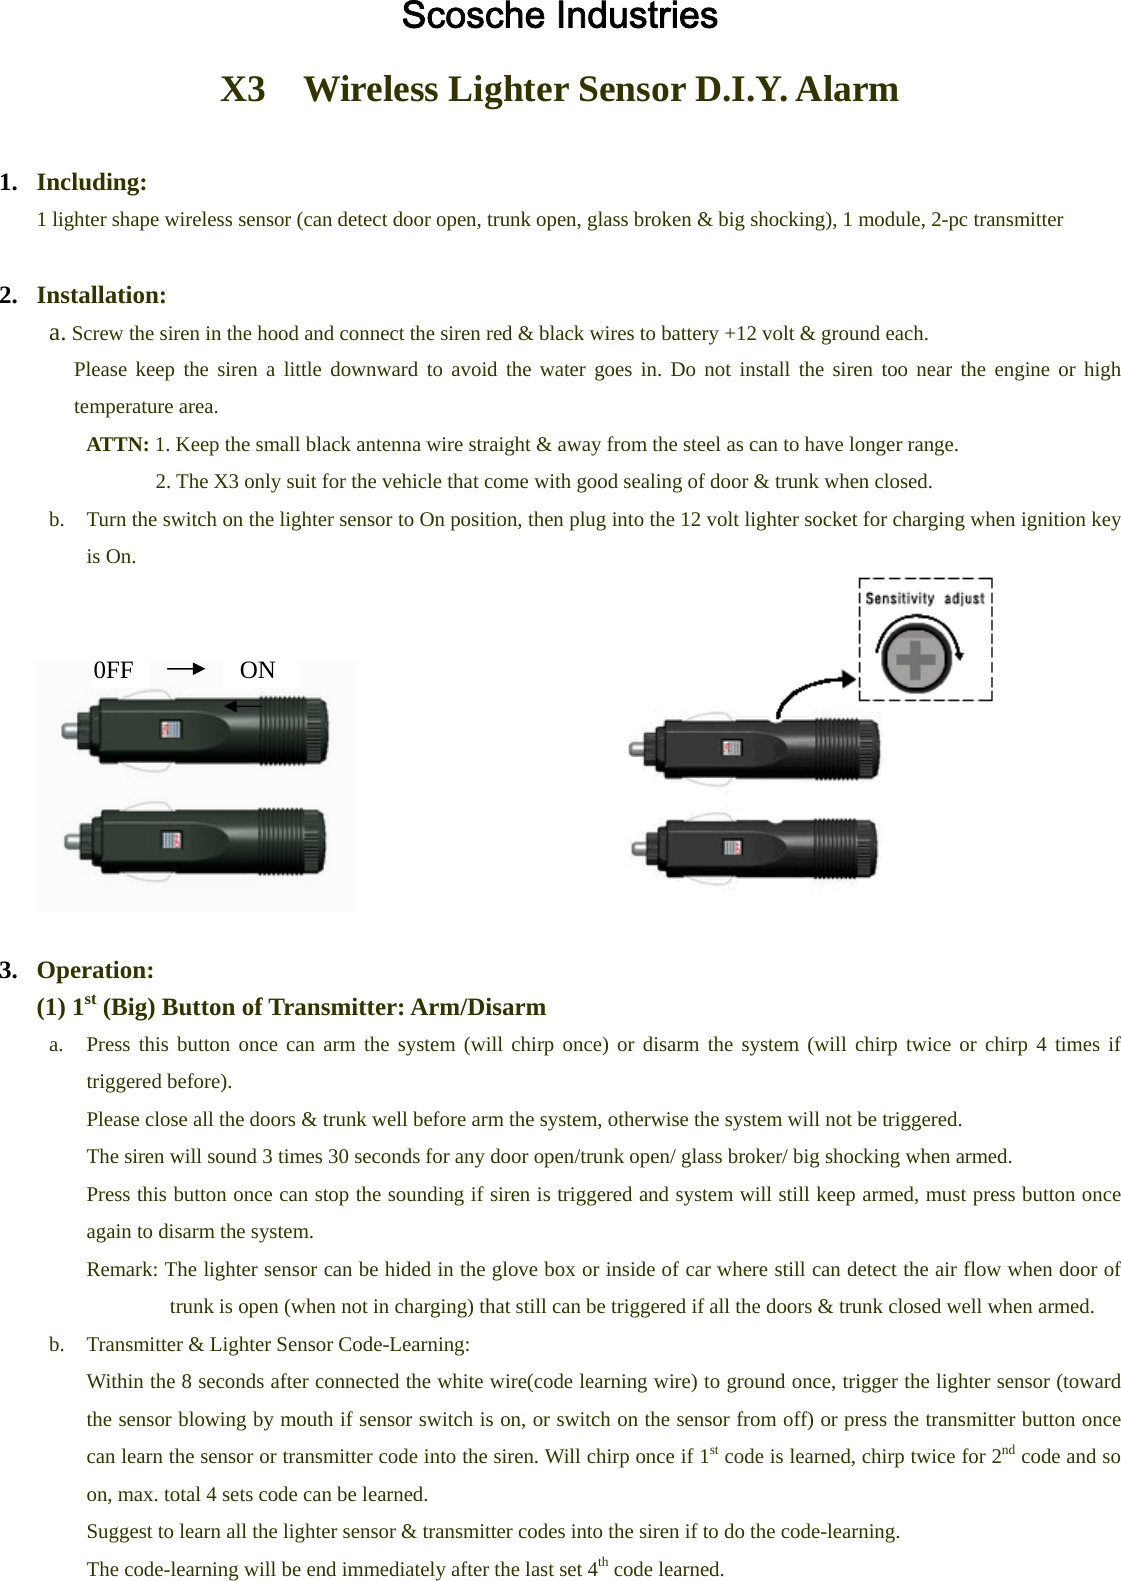 Scosche diyalm2 do it yourself car alarm user manual manual solutioingenieria Image collections